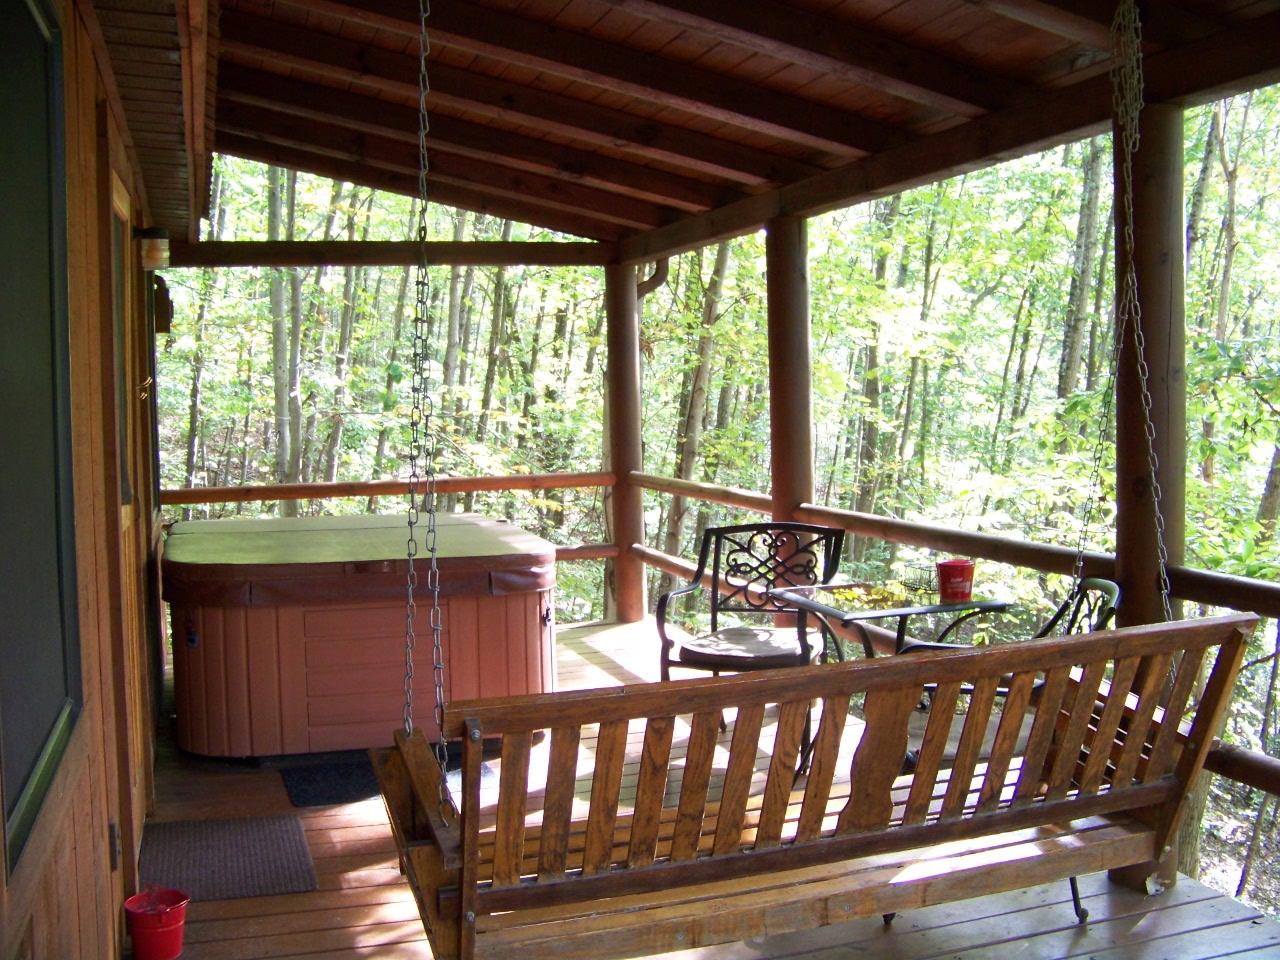 Hocking Hills Cabins Hocking Hills Cottages And Cabins